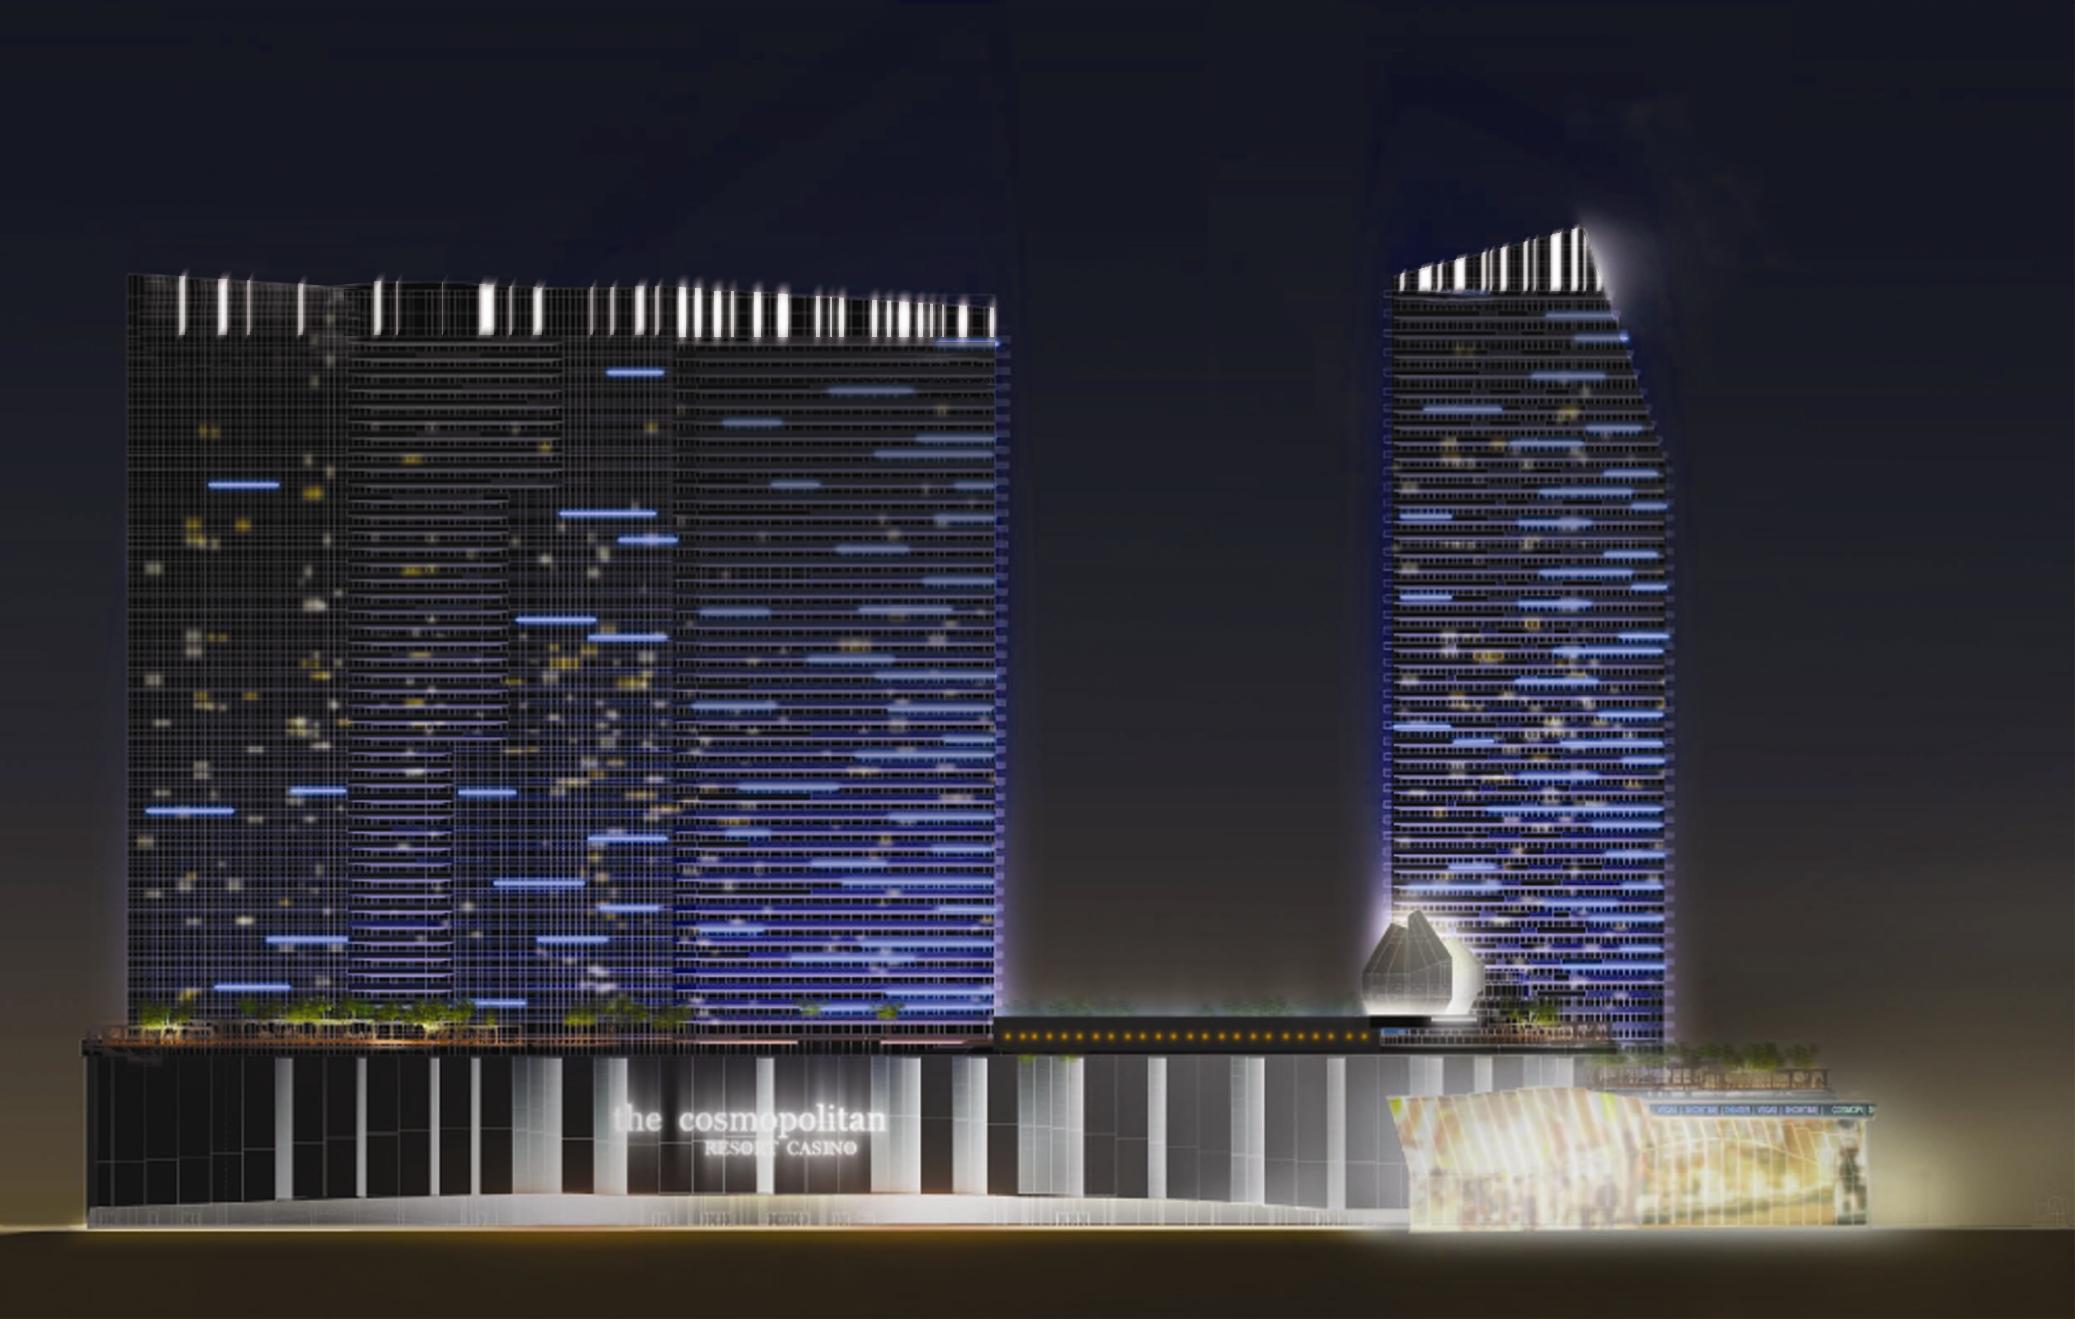 The Cosmopolitan Casino & Resort, Las Vegas